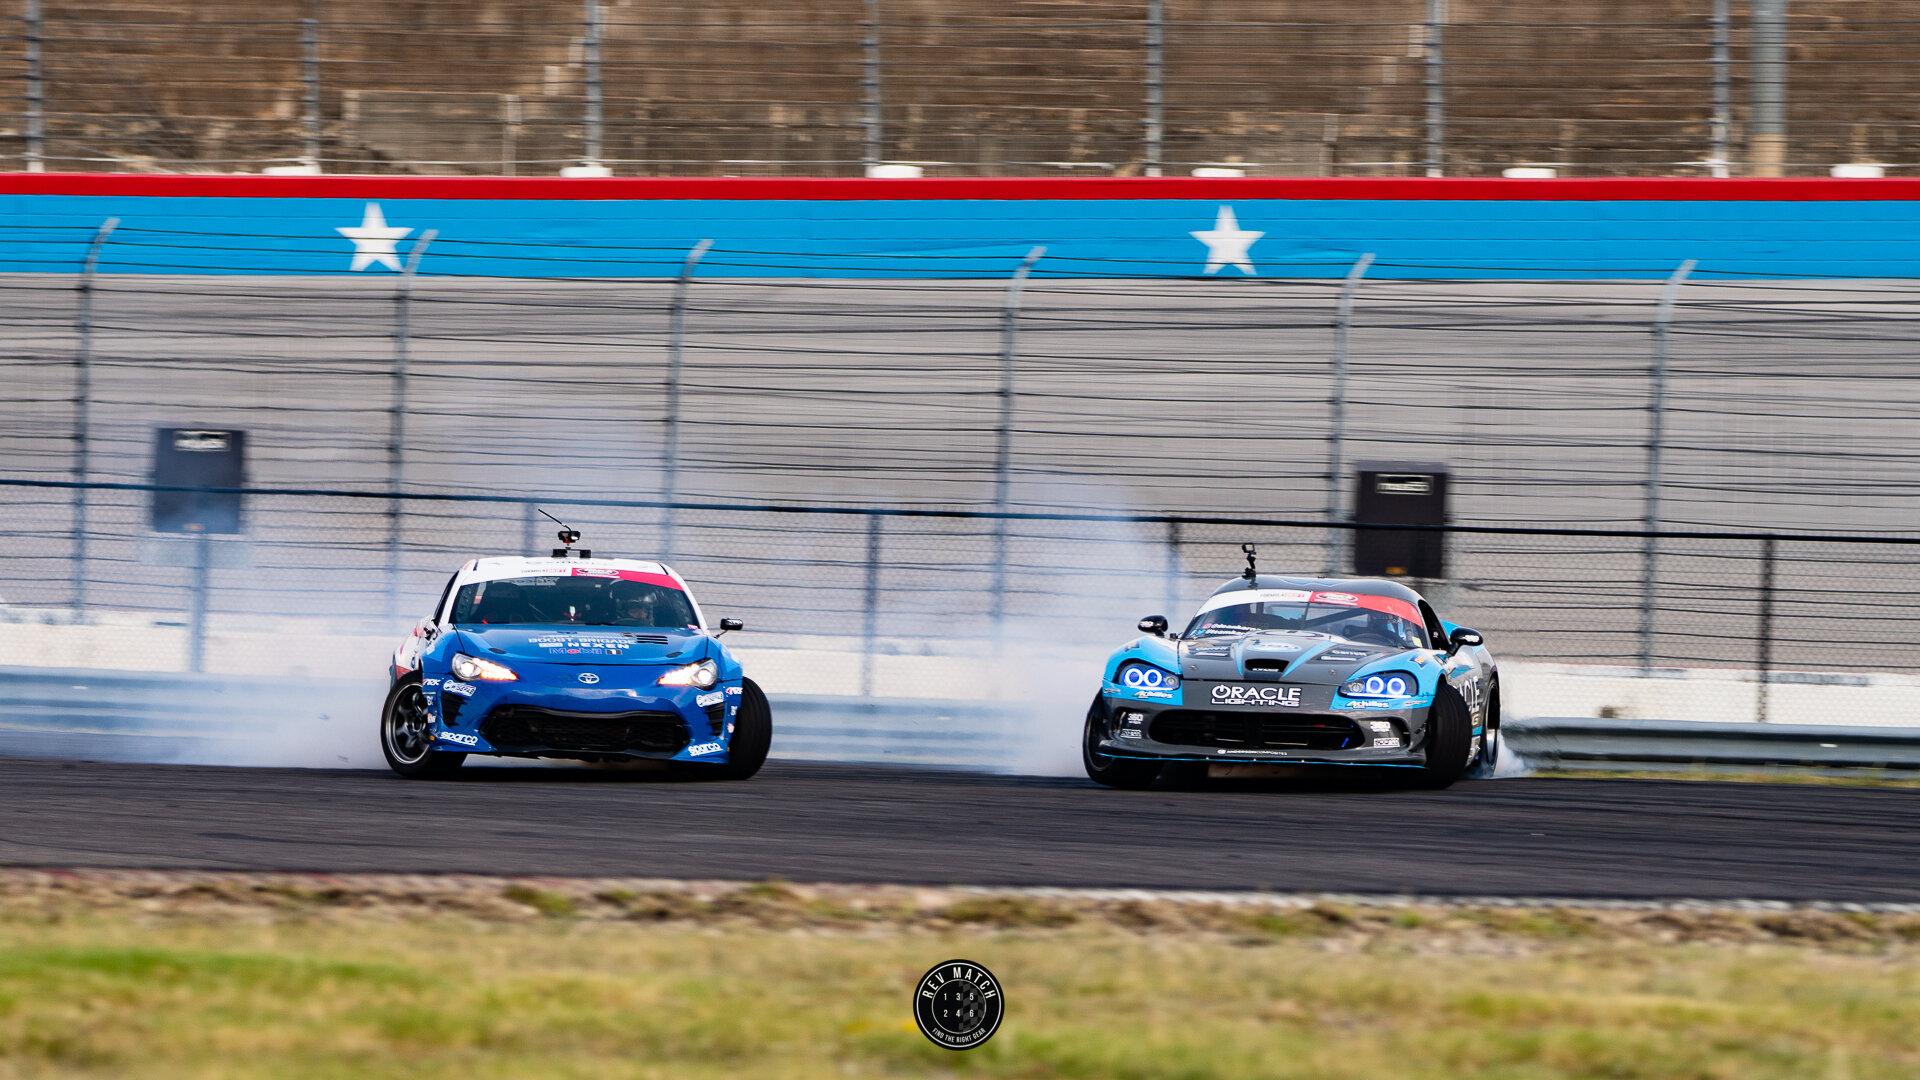 Formula Drift Texas 2019-1.jpg